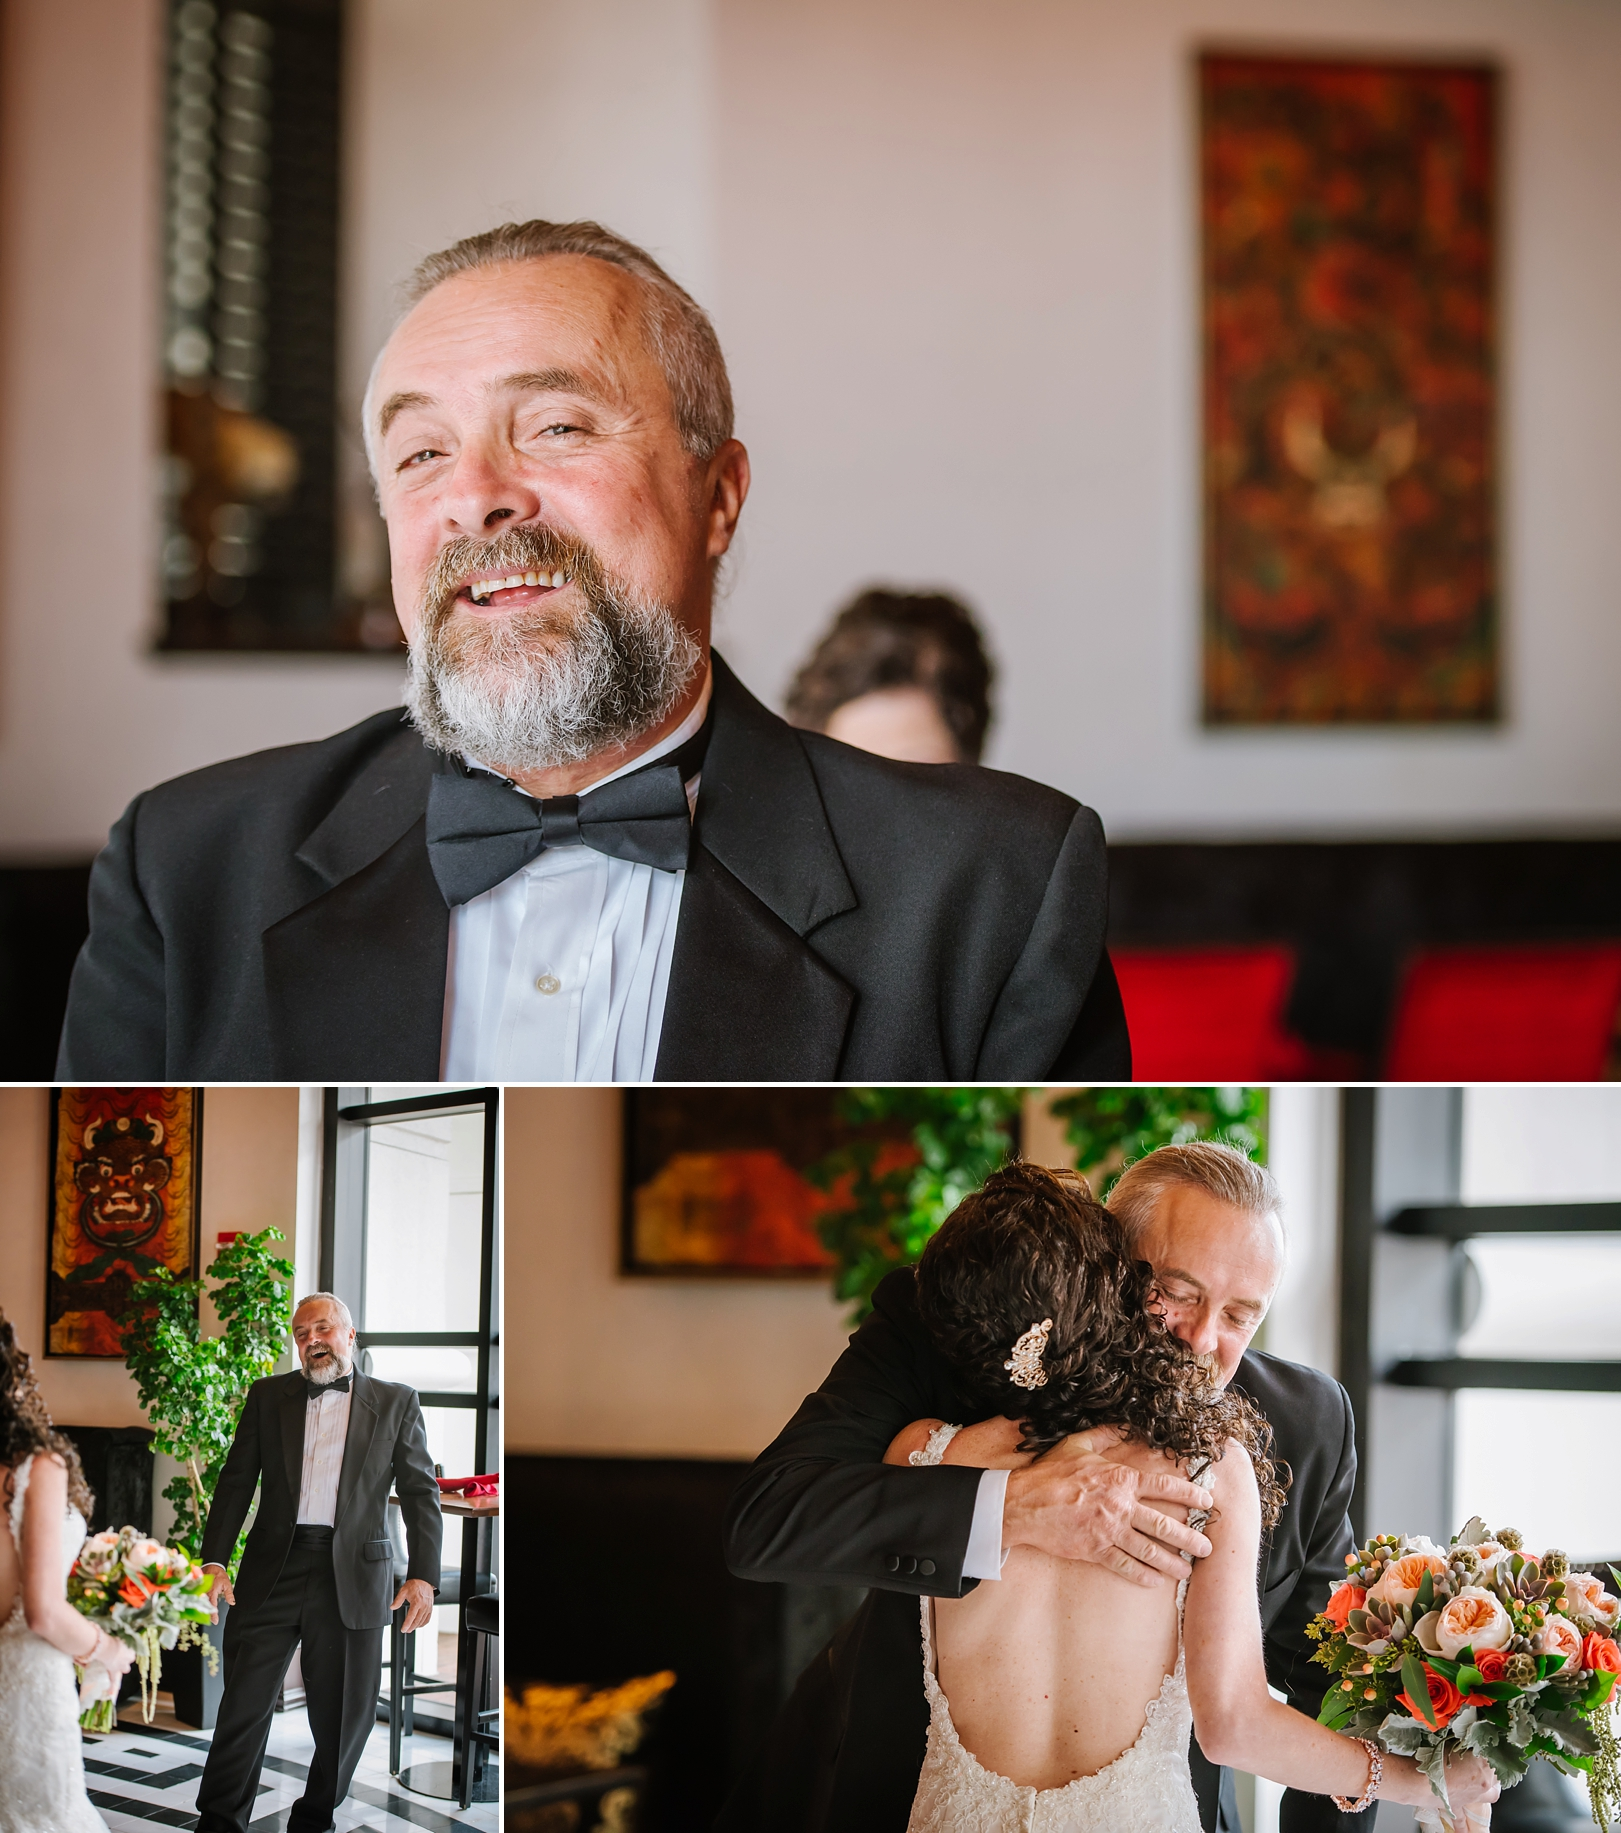 kraft-azalea-gardens-stylish-elopment-wedding-photography_0007.jpg